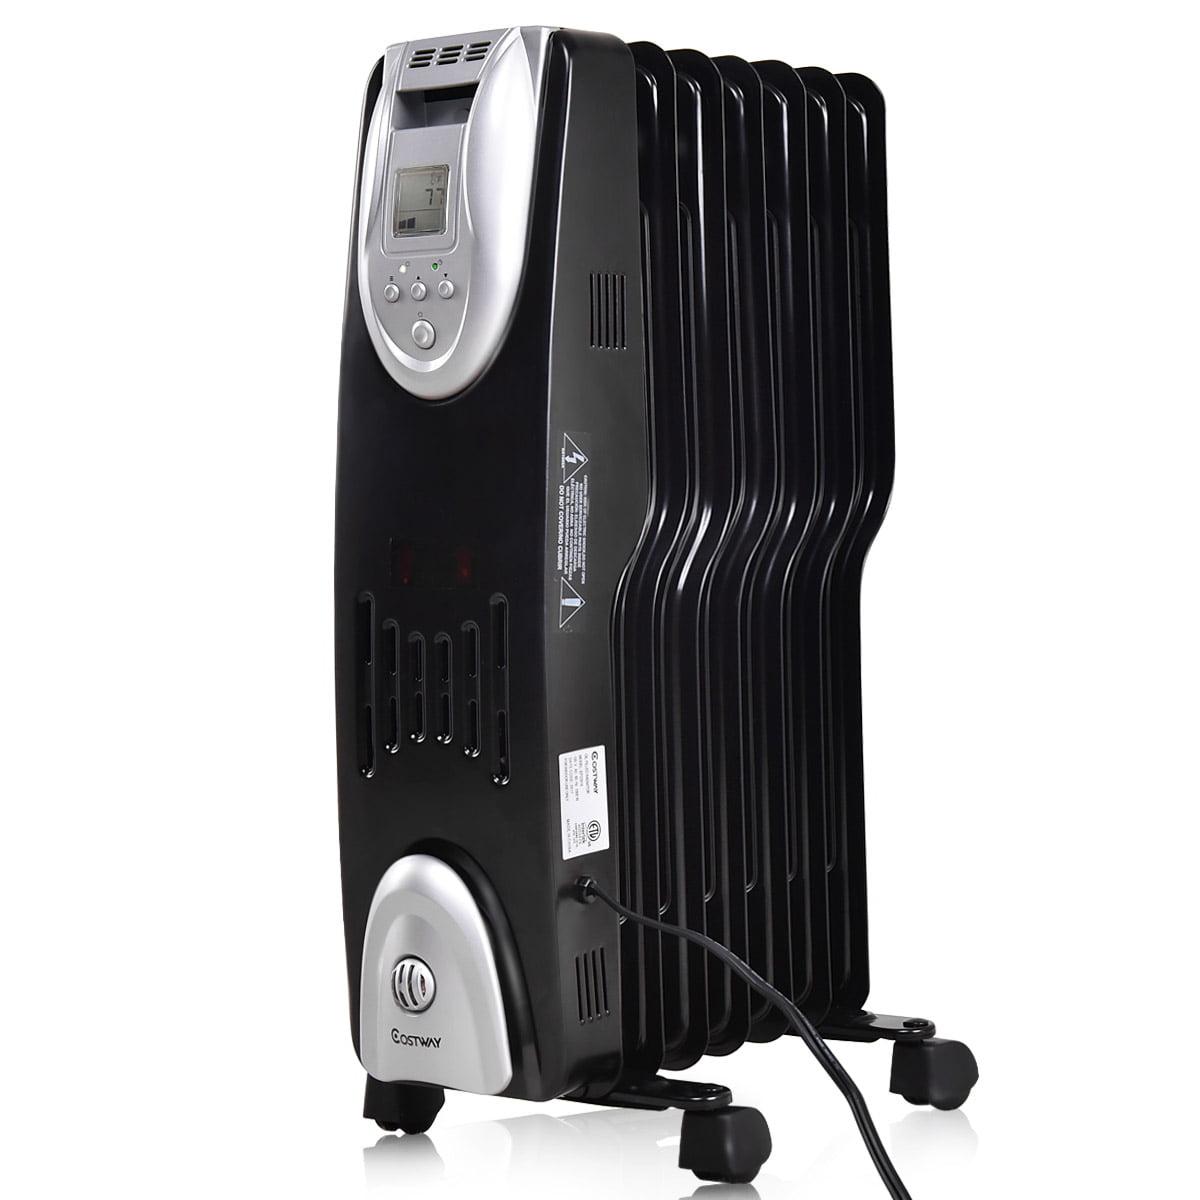 Costway 1500W Electric Oil Filled Radiator Heater Safe Digital Temperature Adjust Timer